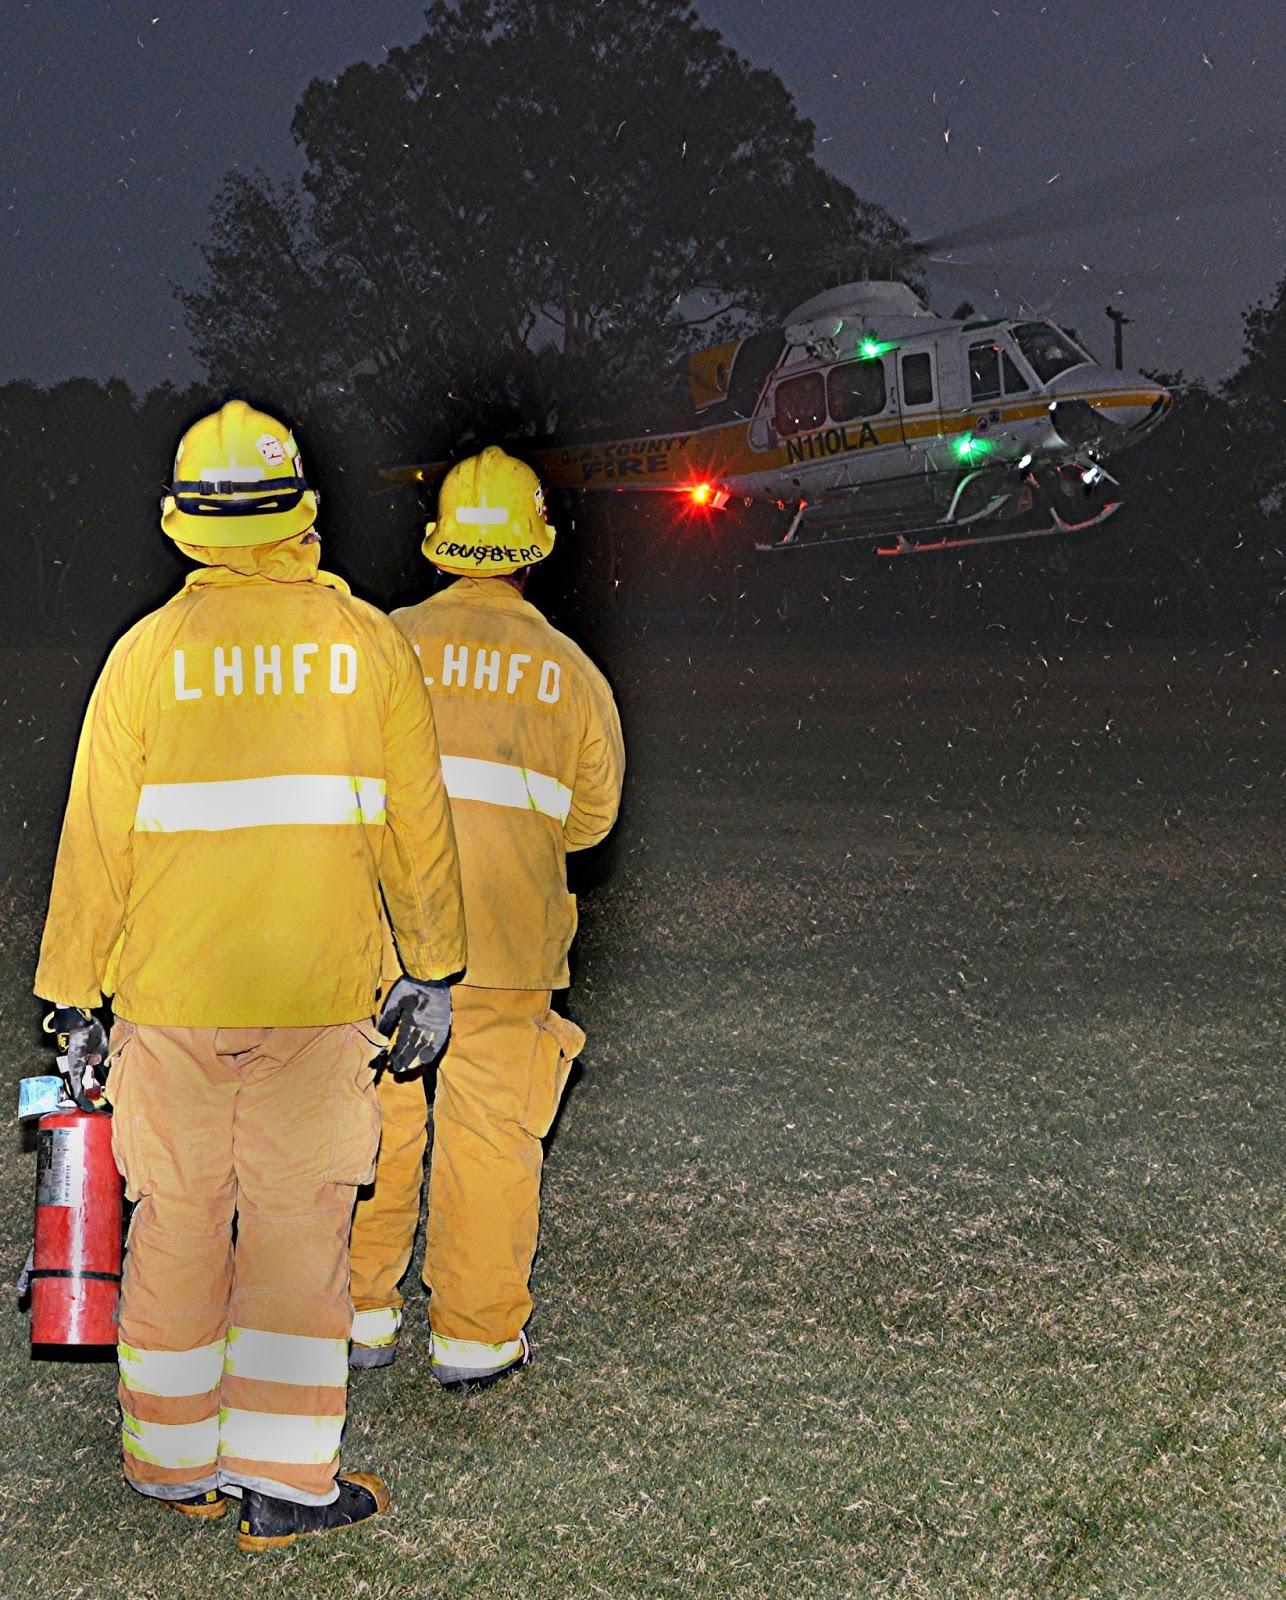 La Habra Heights Fire Department News & Information: 2016